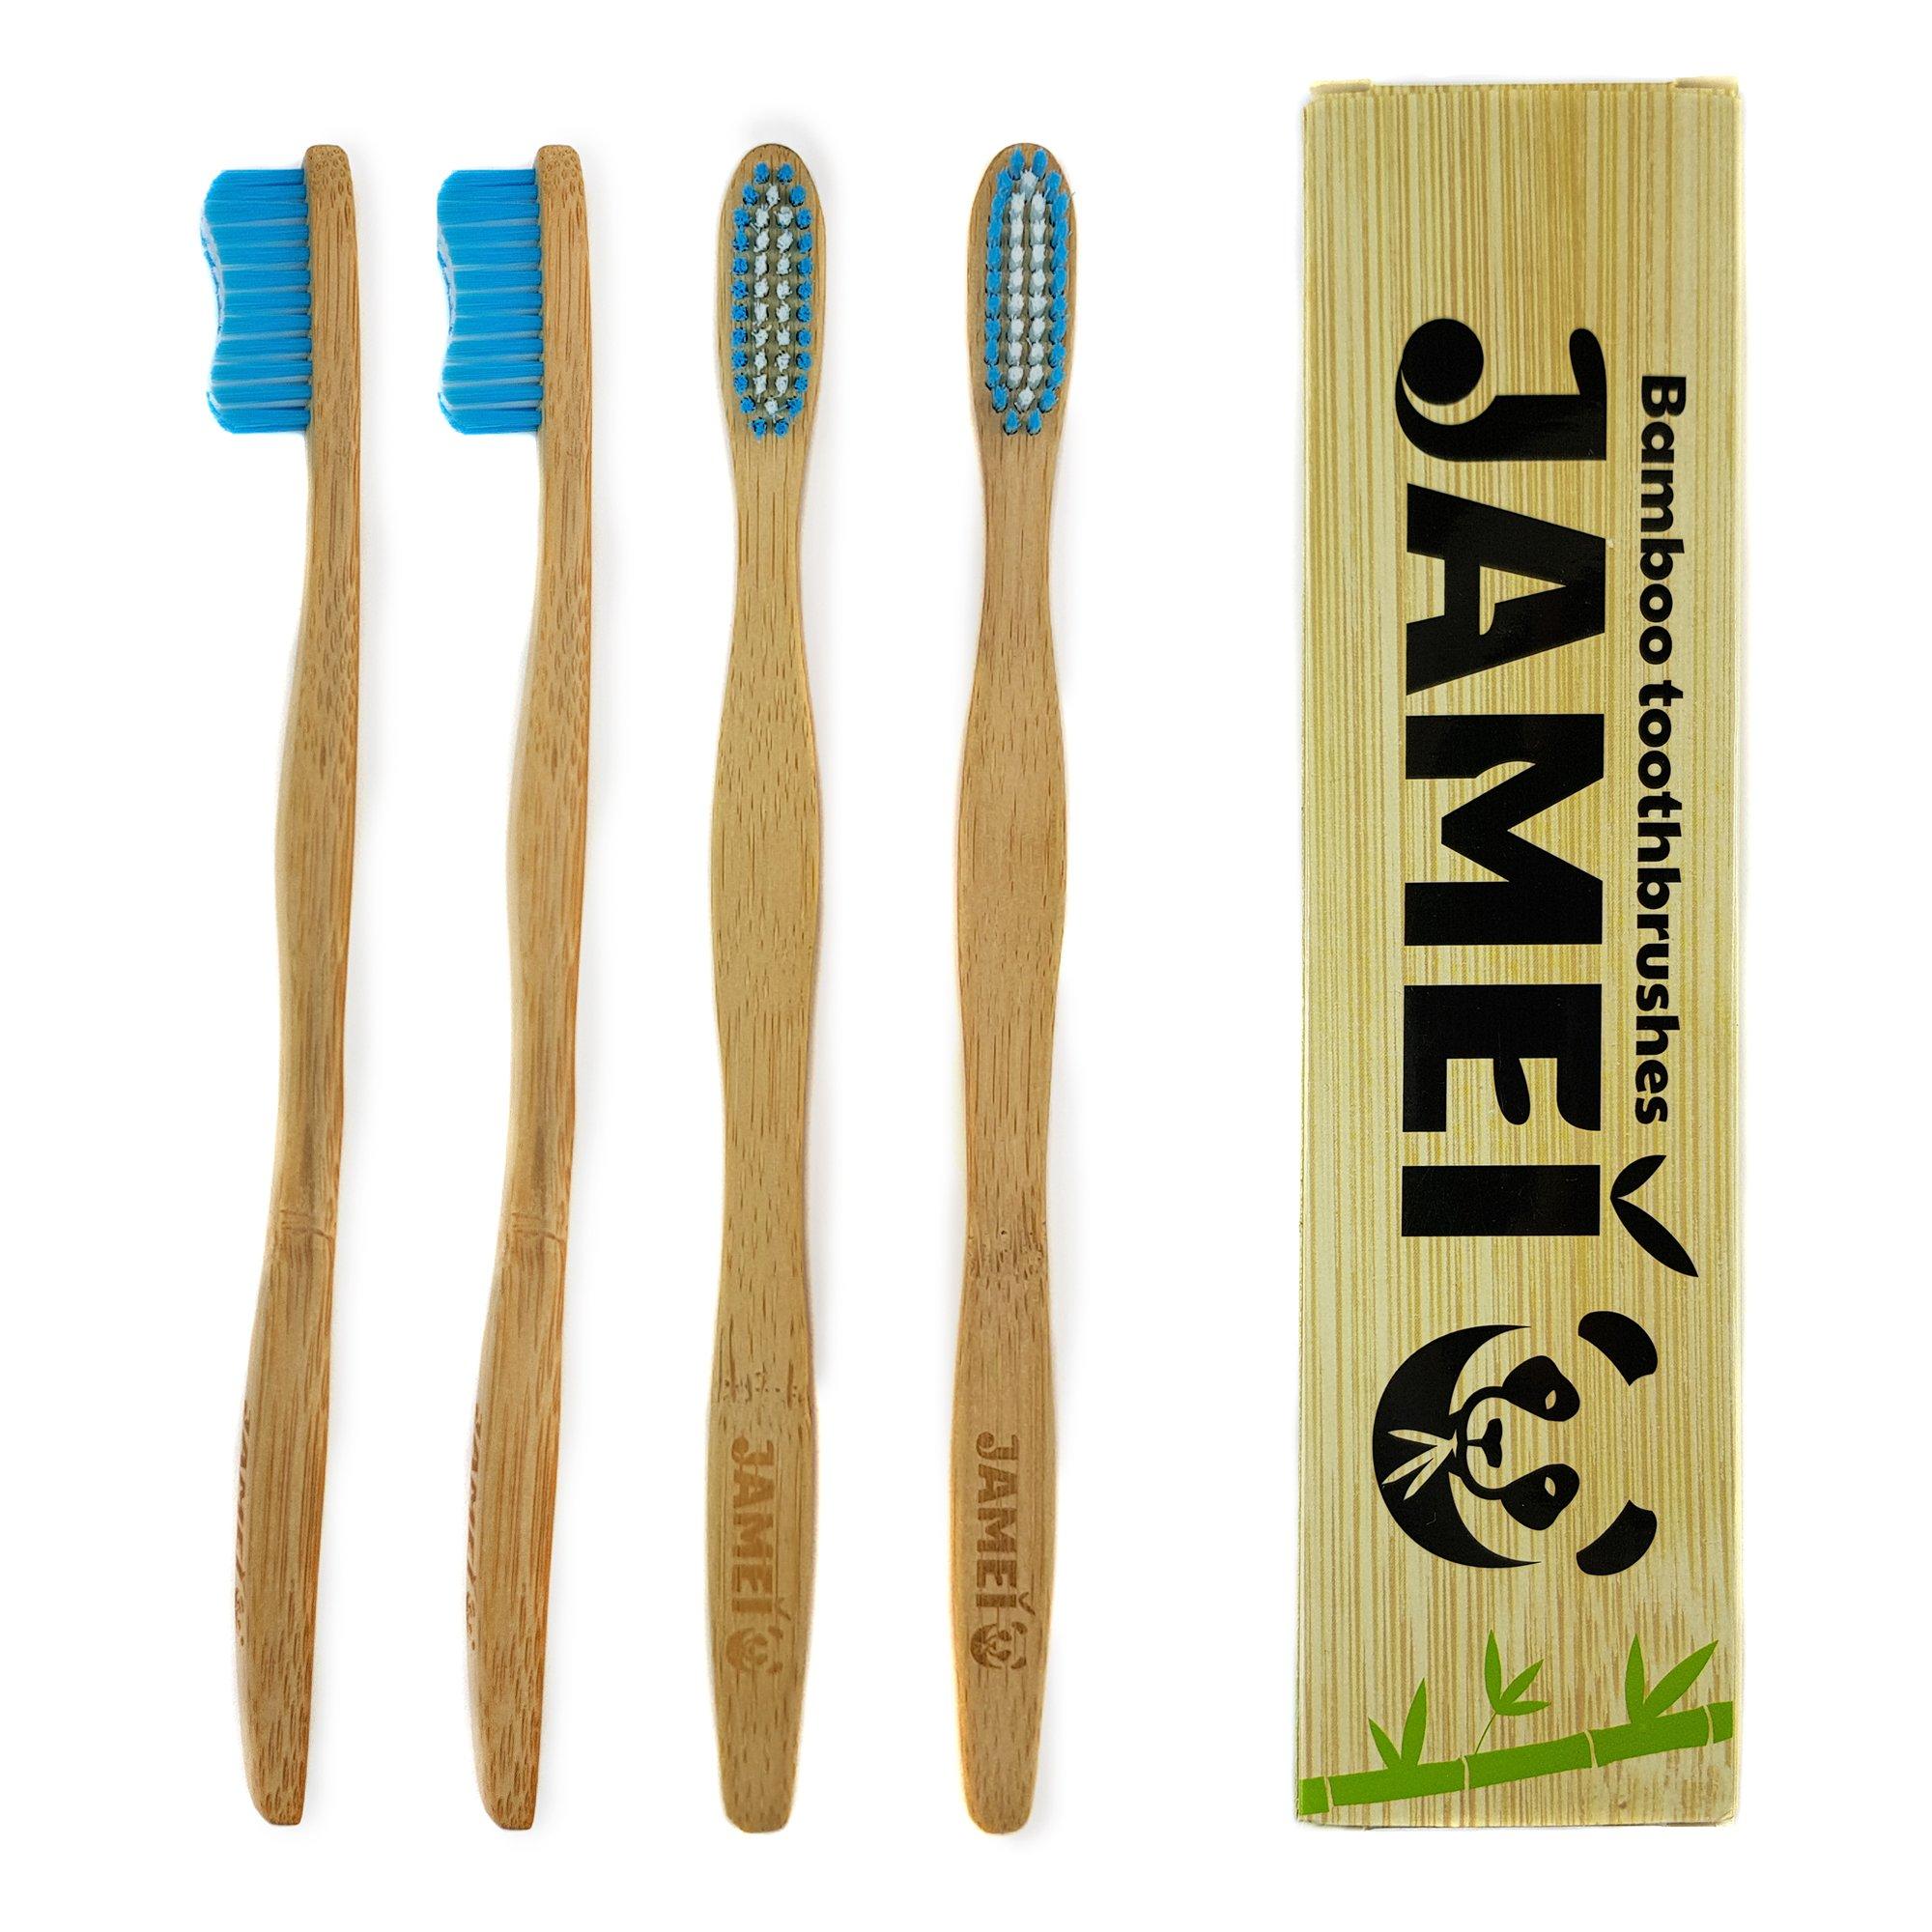 Bamboo Toothbrush Biodegradable Natural Handle, BPA Free Nylon Medium Bristles 4 Pack by Jamei - We Plant Trees